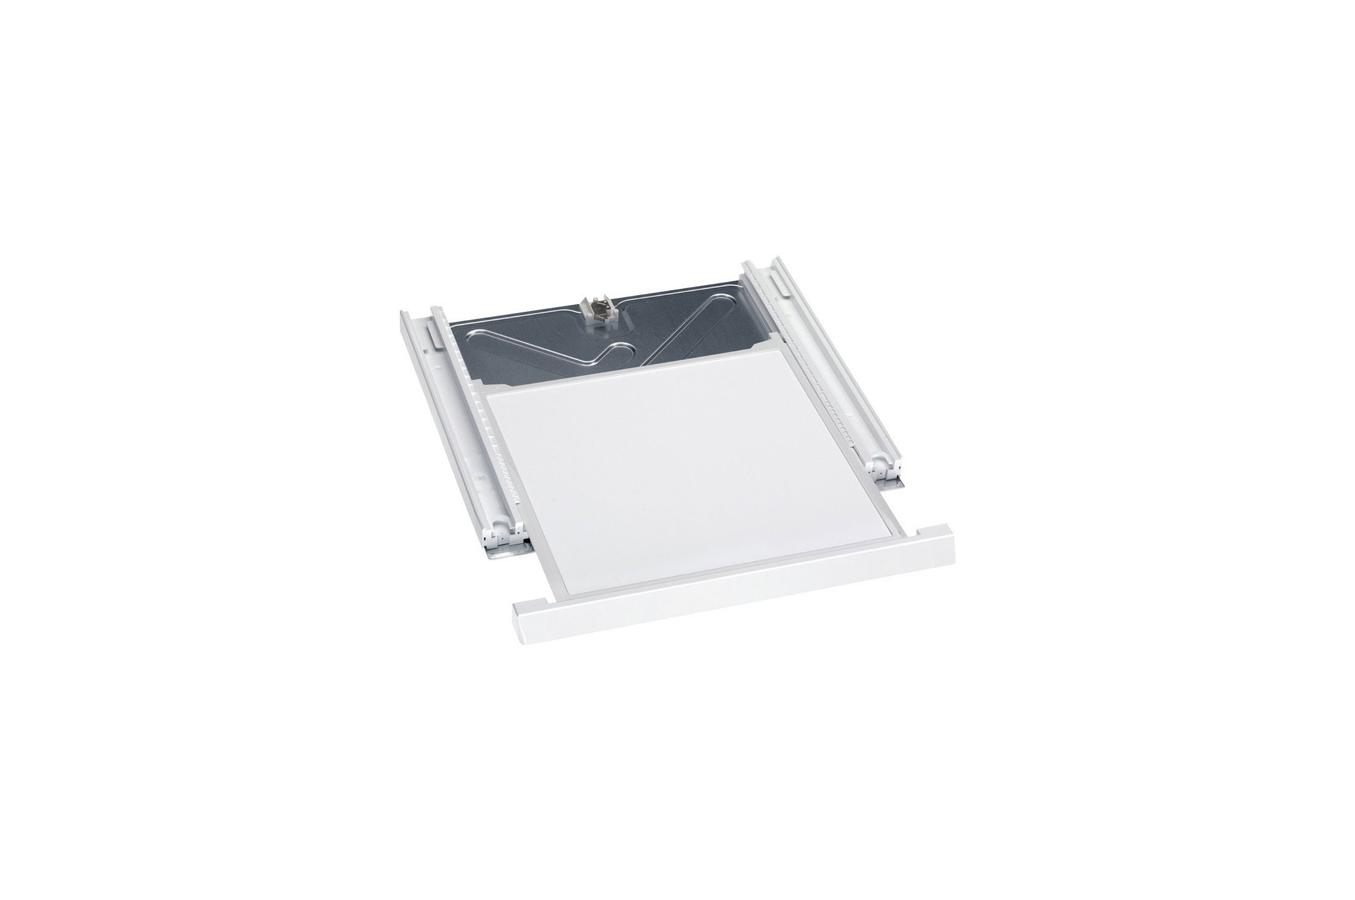 kit de superposition miele wtv 406 2306107 darty. Black Bedroom Furniture Sets. Home Design Ideas